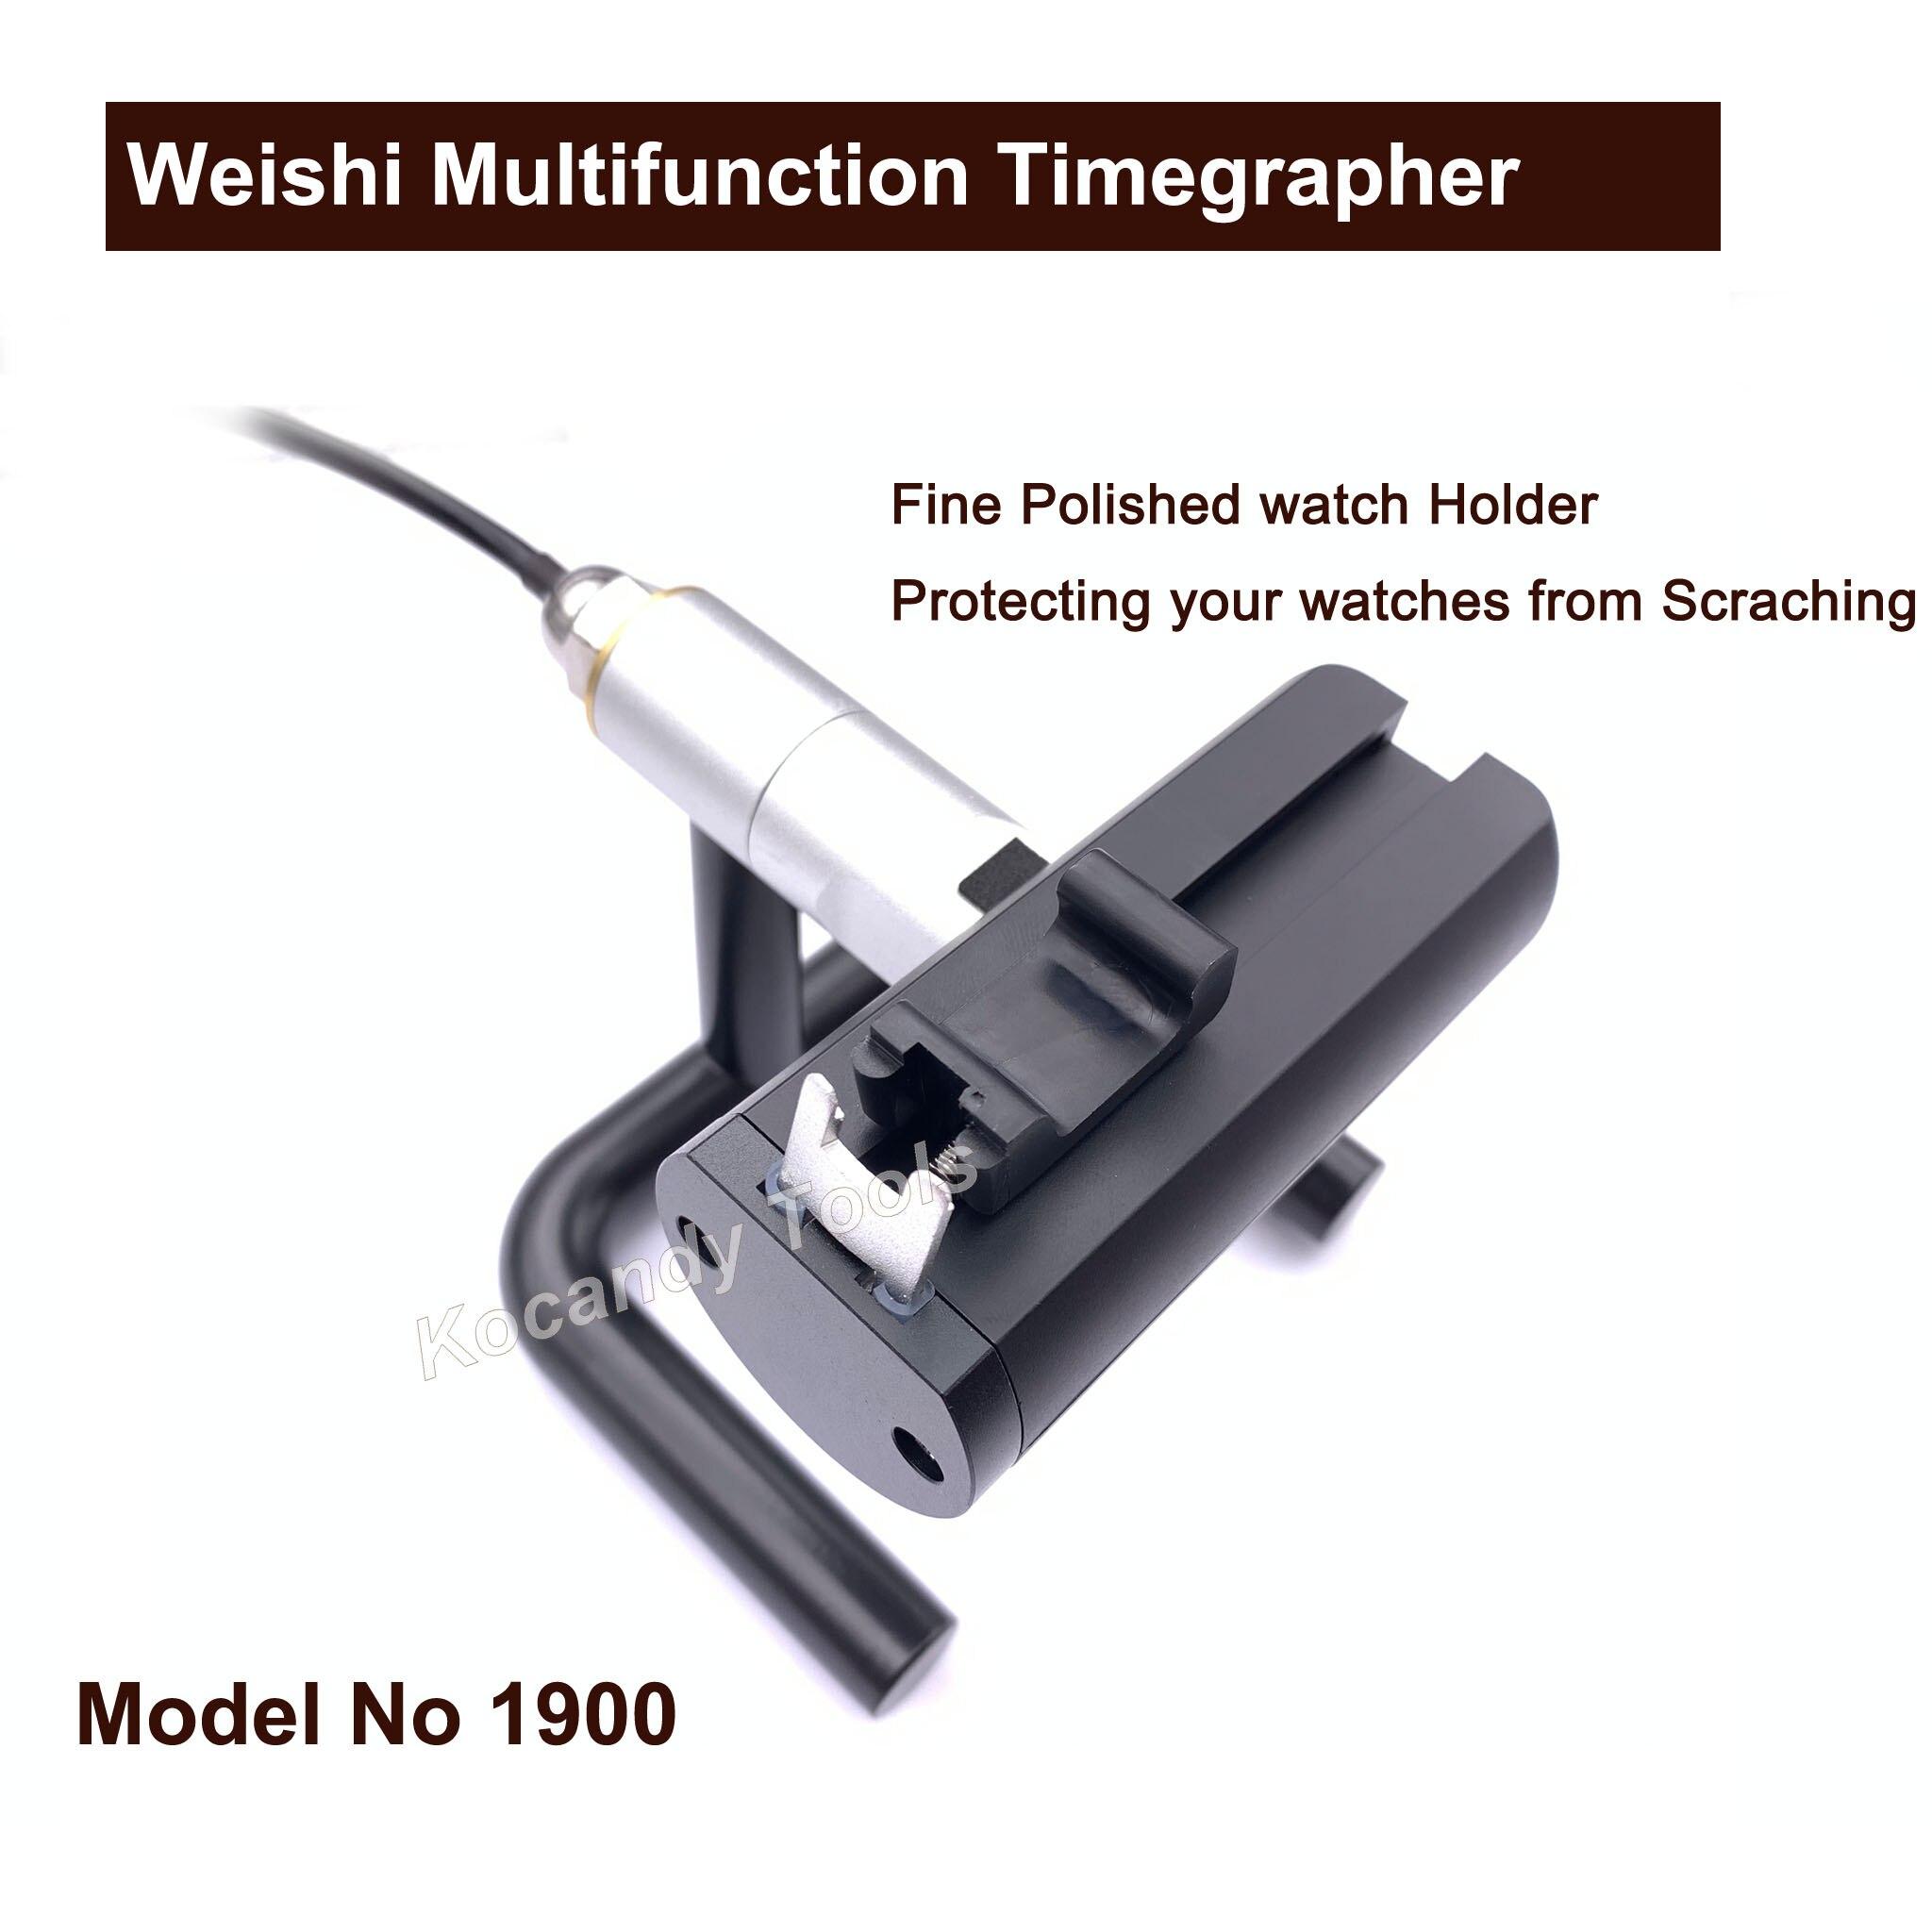 Weishi 1900 Multifunction Timegrapher, Professional Watch Timing 기계 Multifunction Timegrapher 대 한 시계 제조 Repair 툴-에서수리 도구 & 키트부터 시계 의  그룹 3